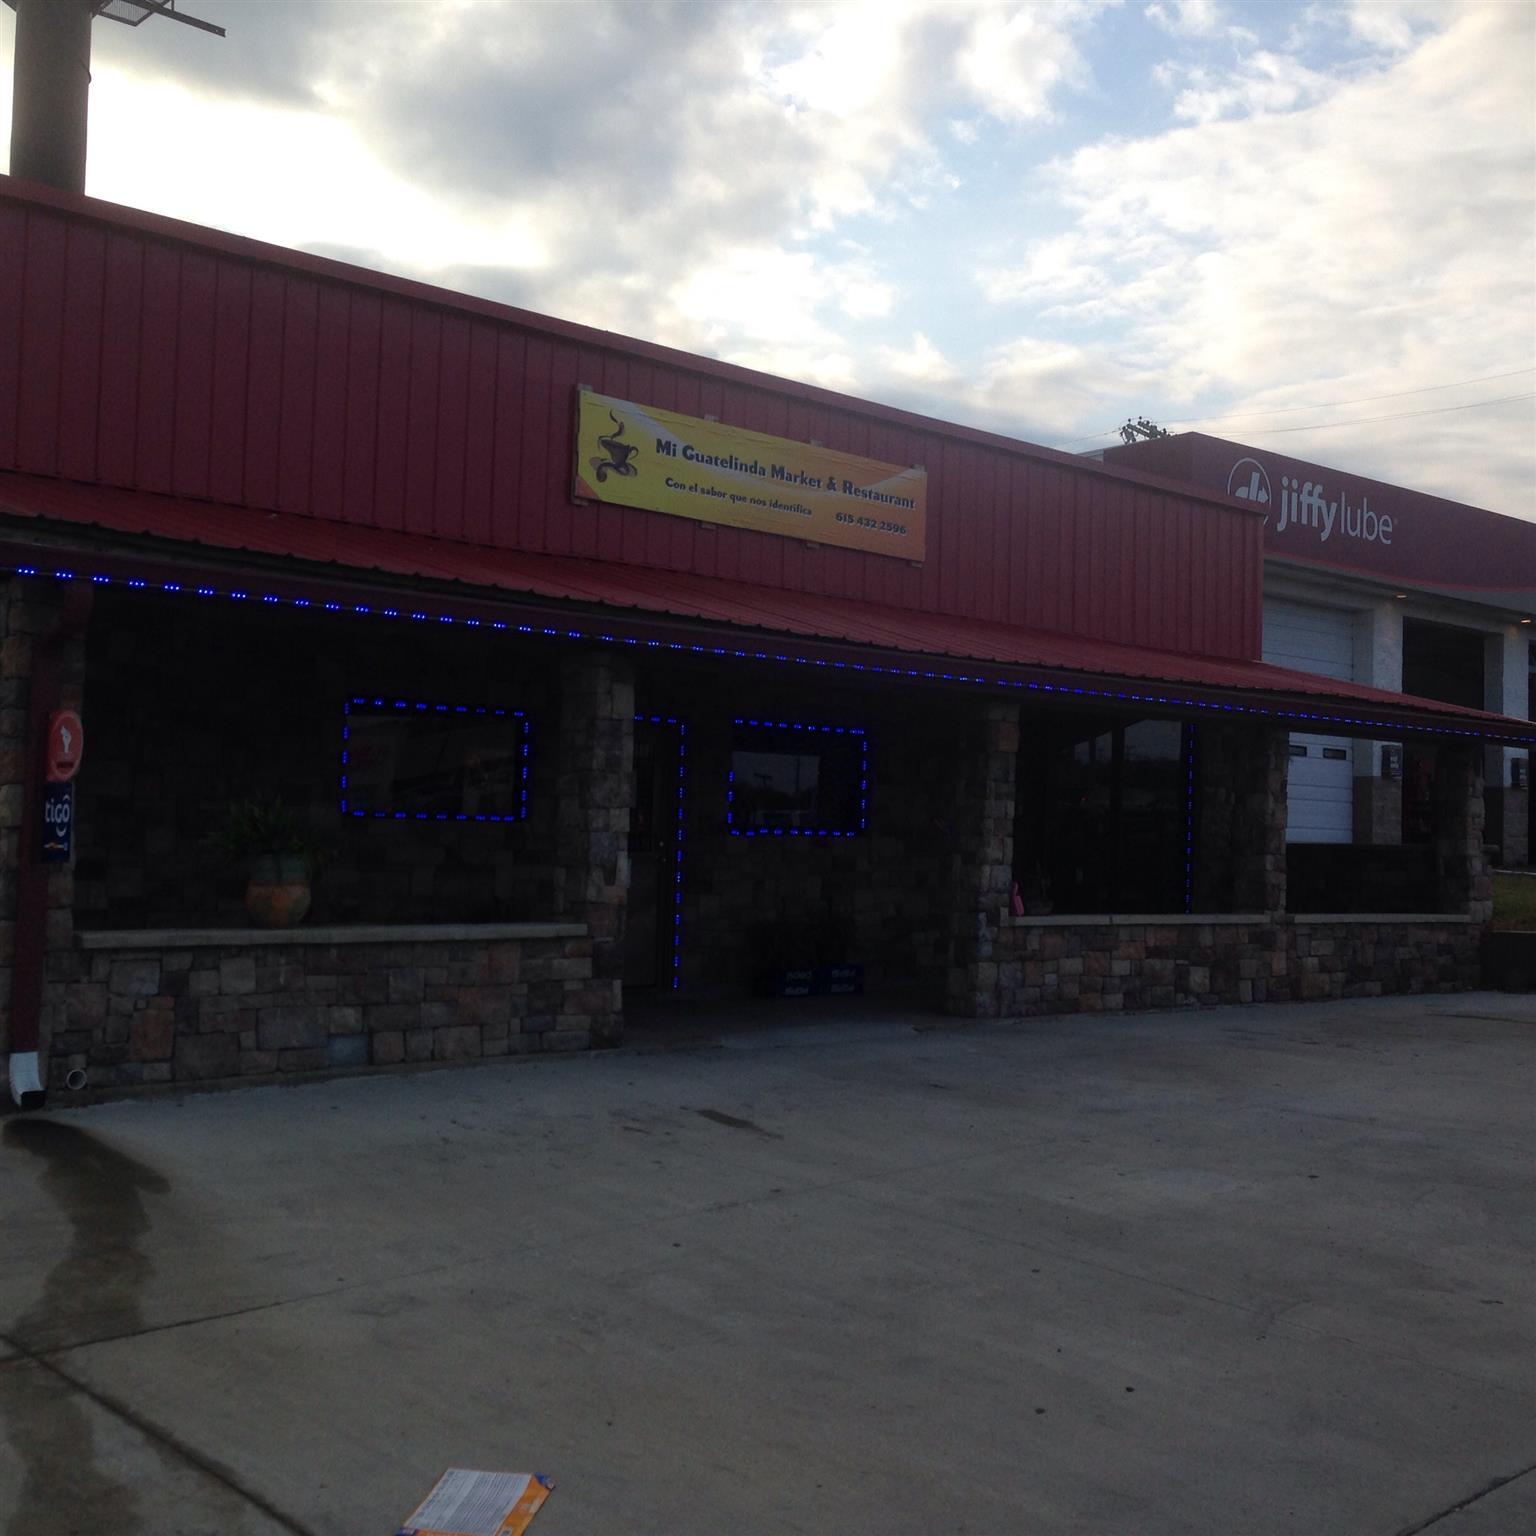 1021 Gallatin pike s, Madison, TN 37115